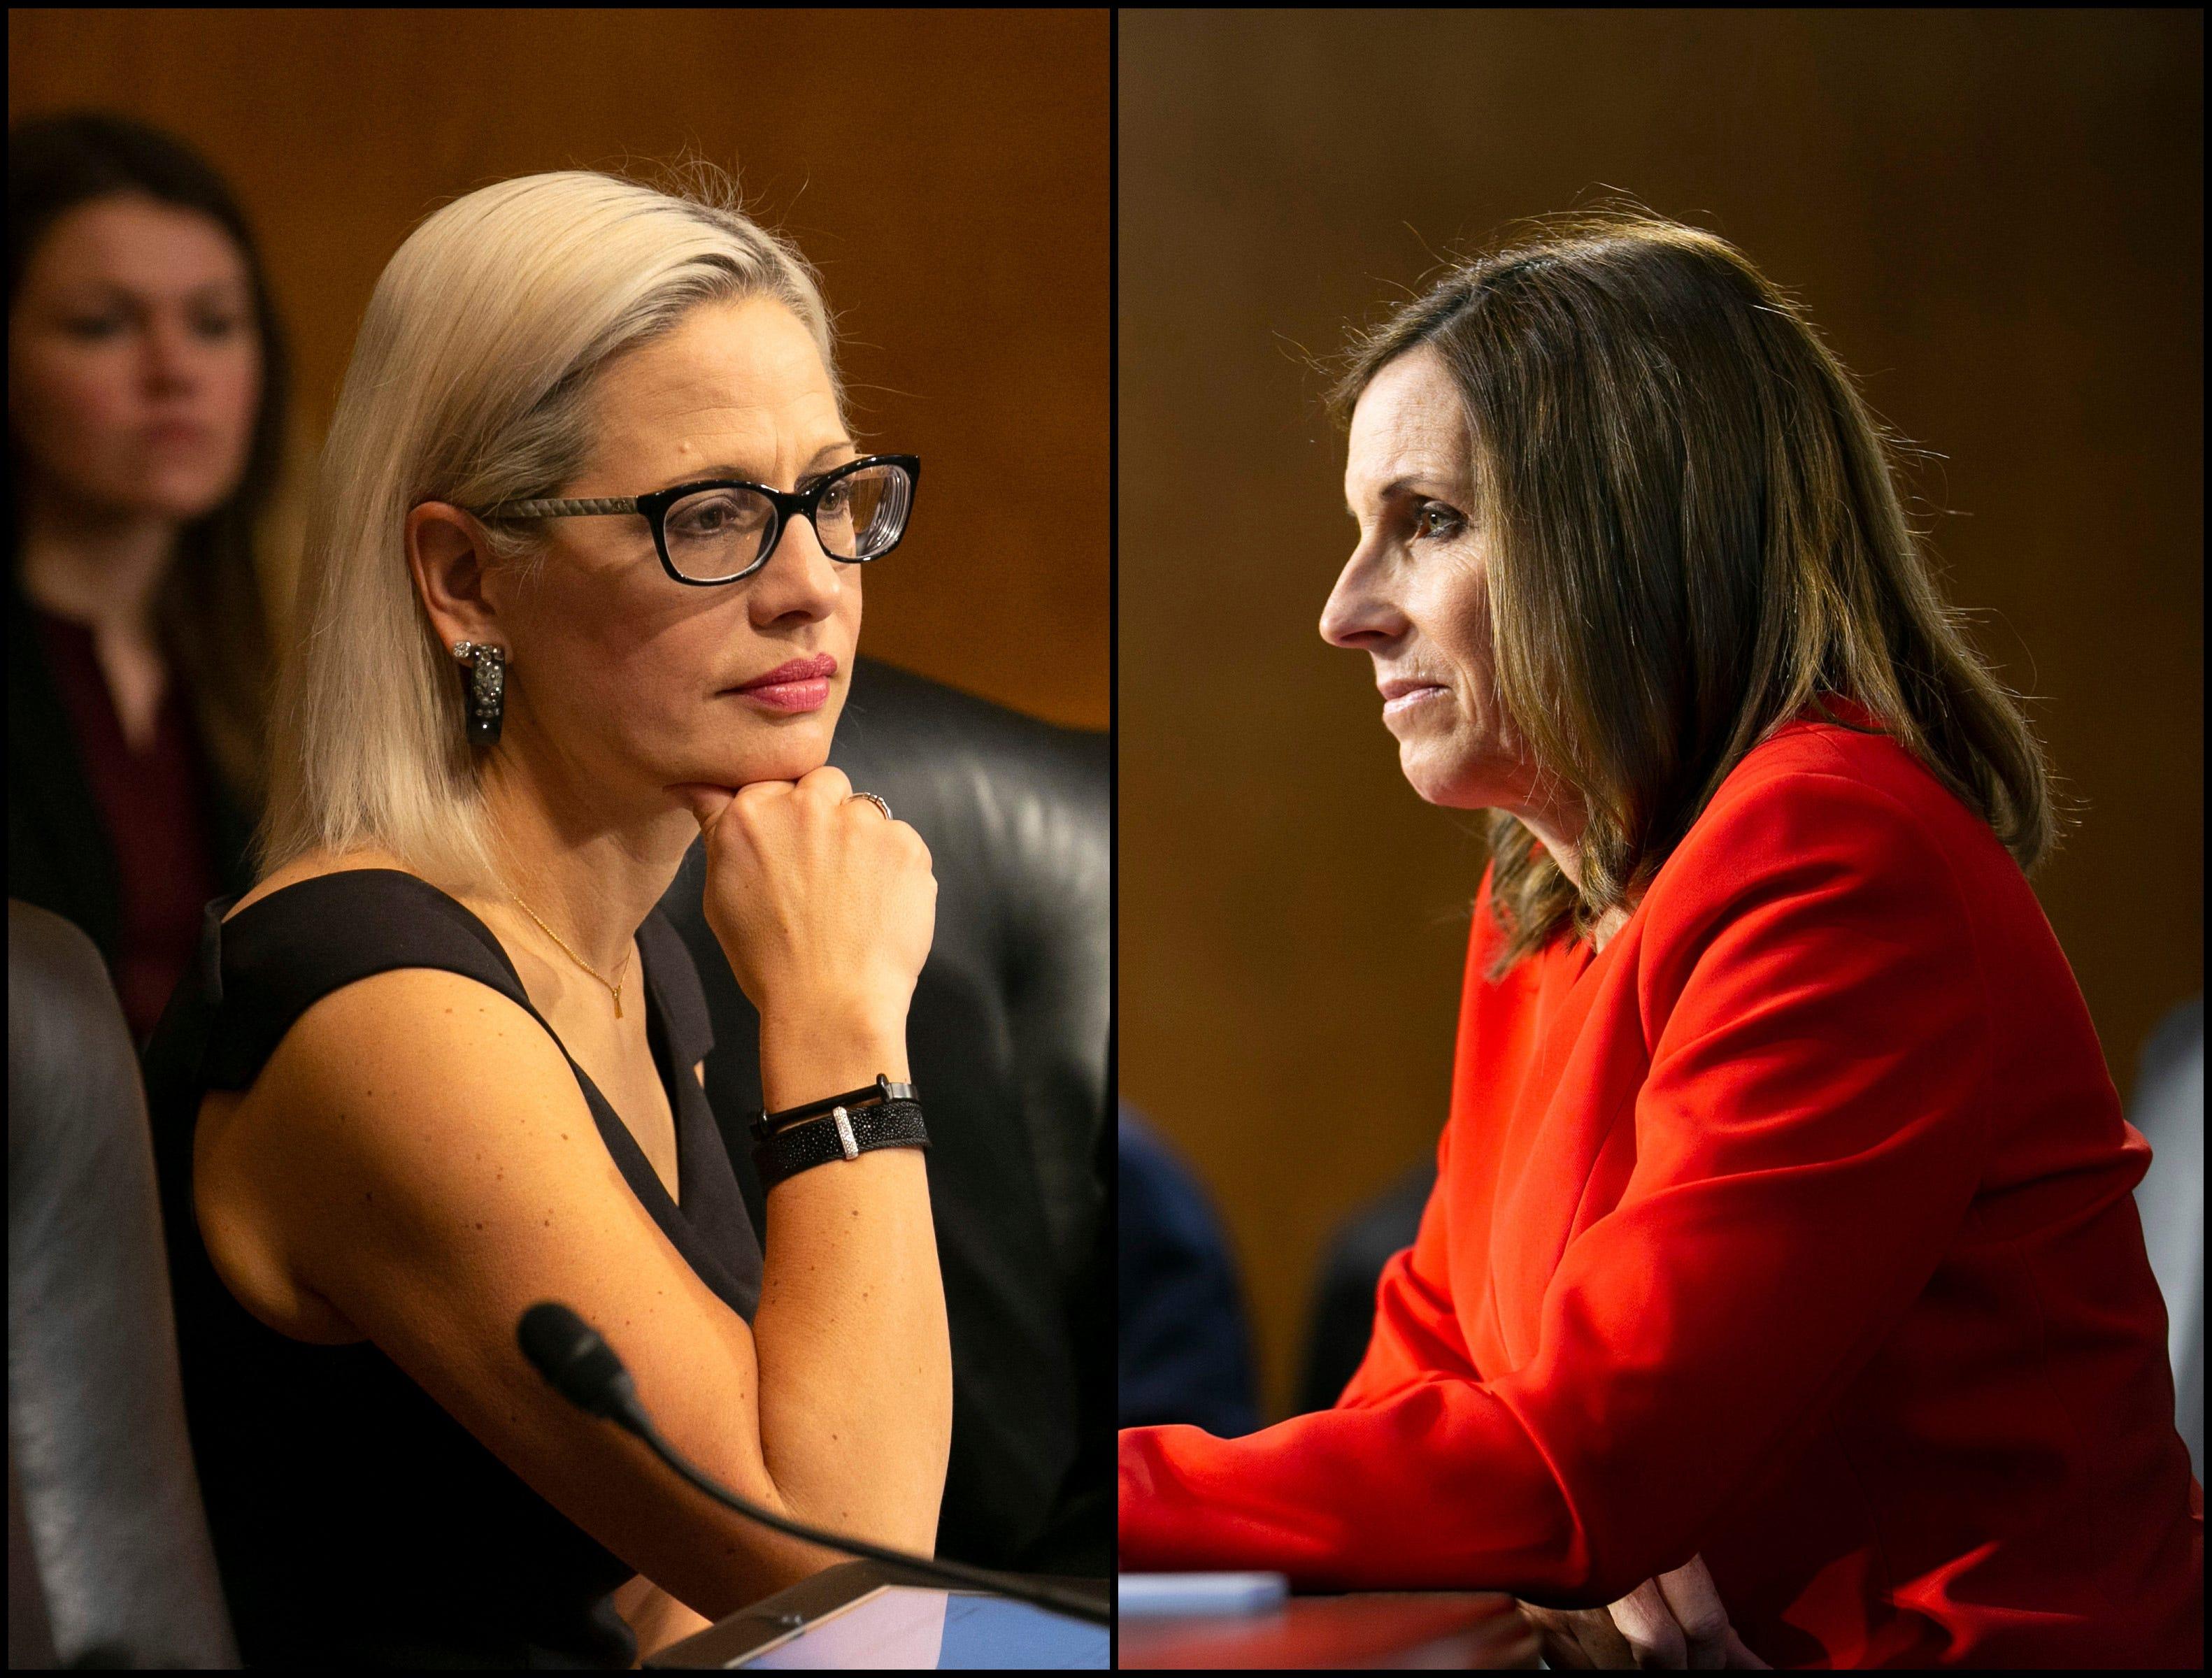 Here's how Sens. Kyrsten Sinema and Martha McSally voted on Trump border emergency rebuke